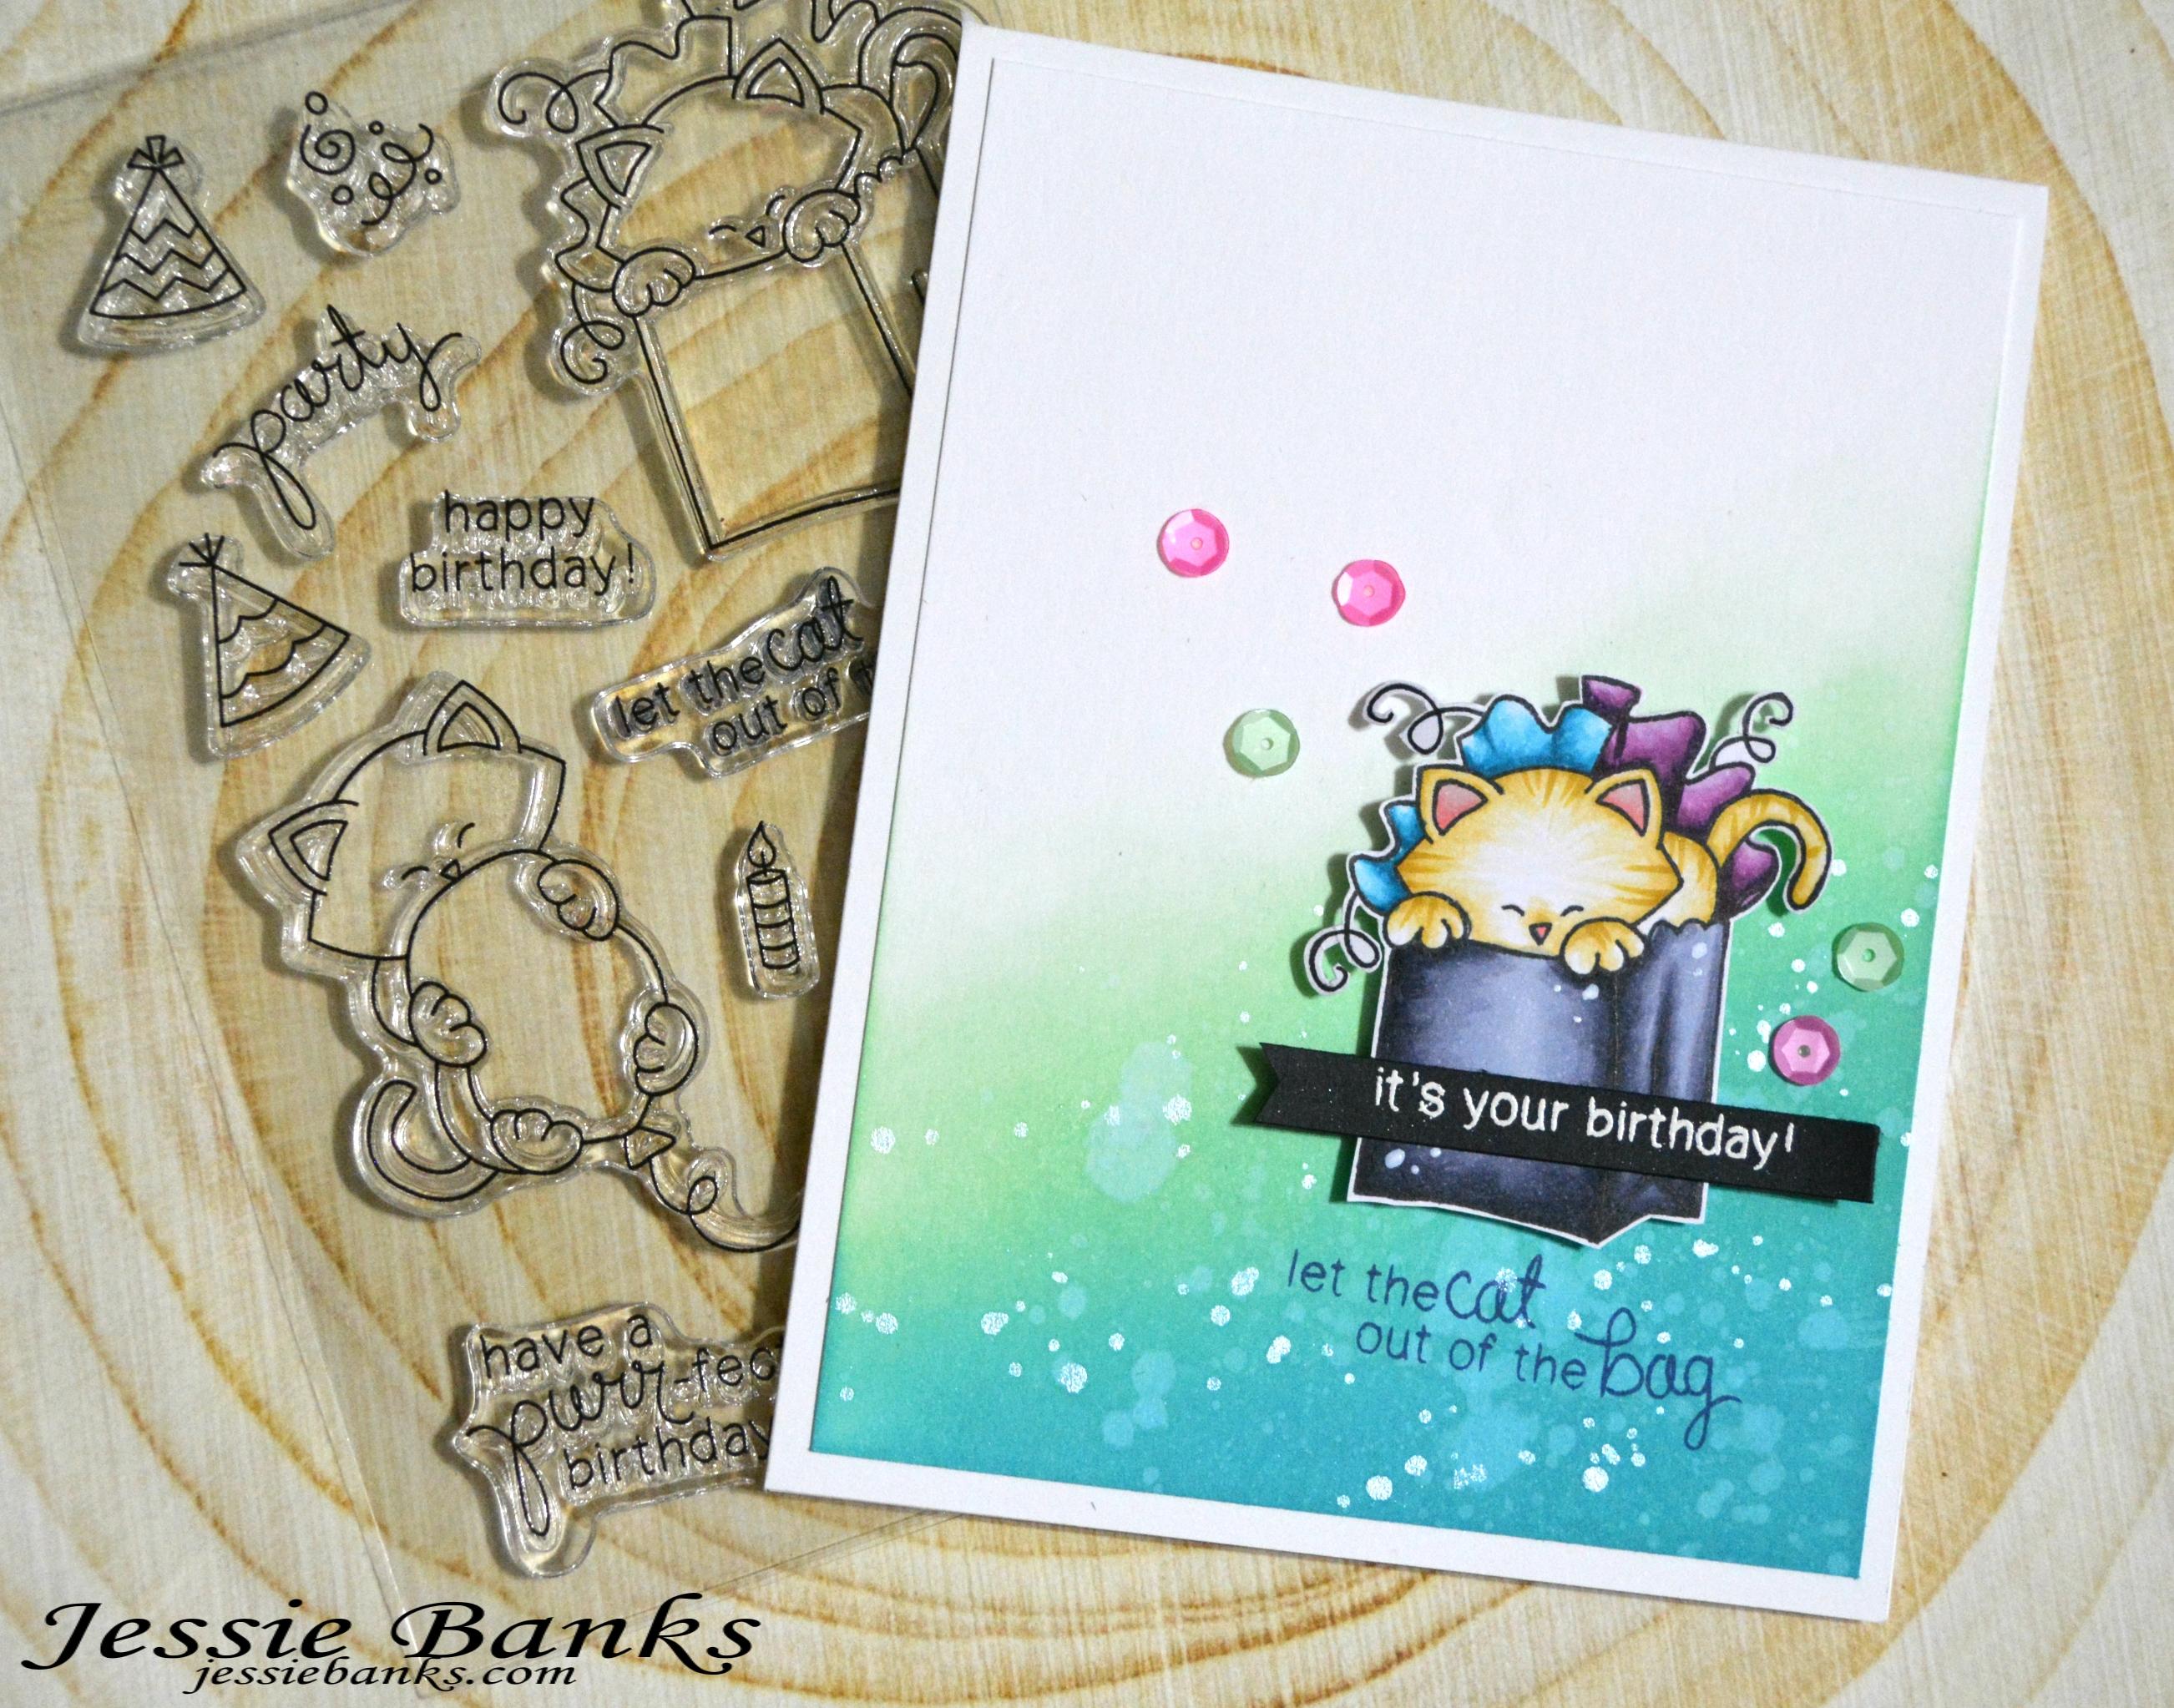 BirthdayCard by January Guest Designer Jessie Banks | Newton's Birthday Bash Stamp Set by Newton's Nook Designs #newtonsnook #handmade